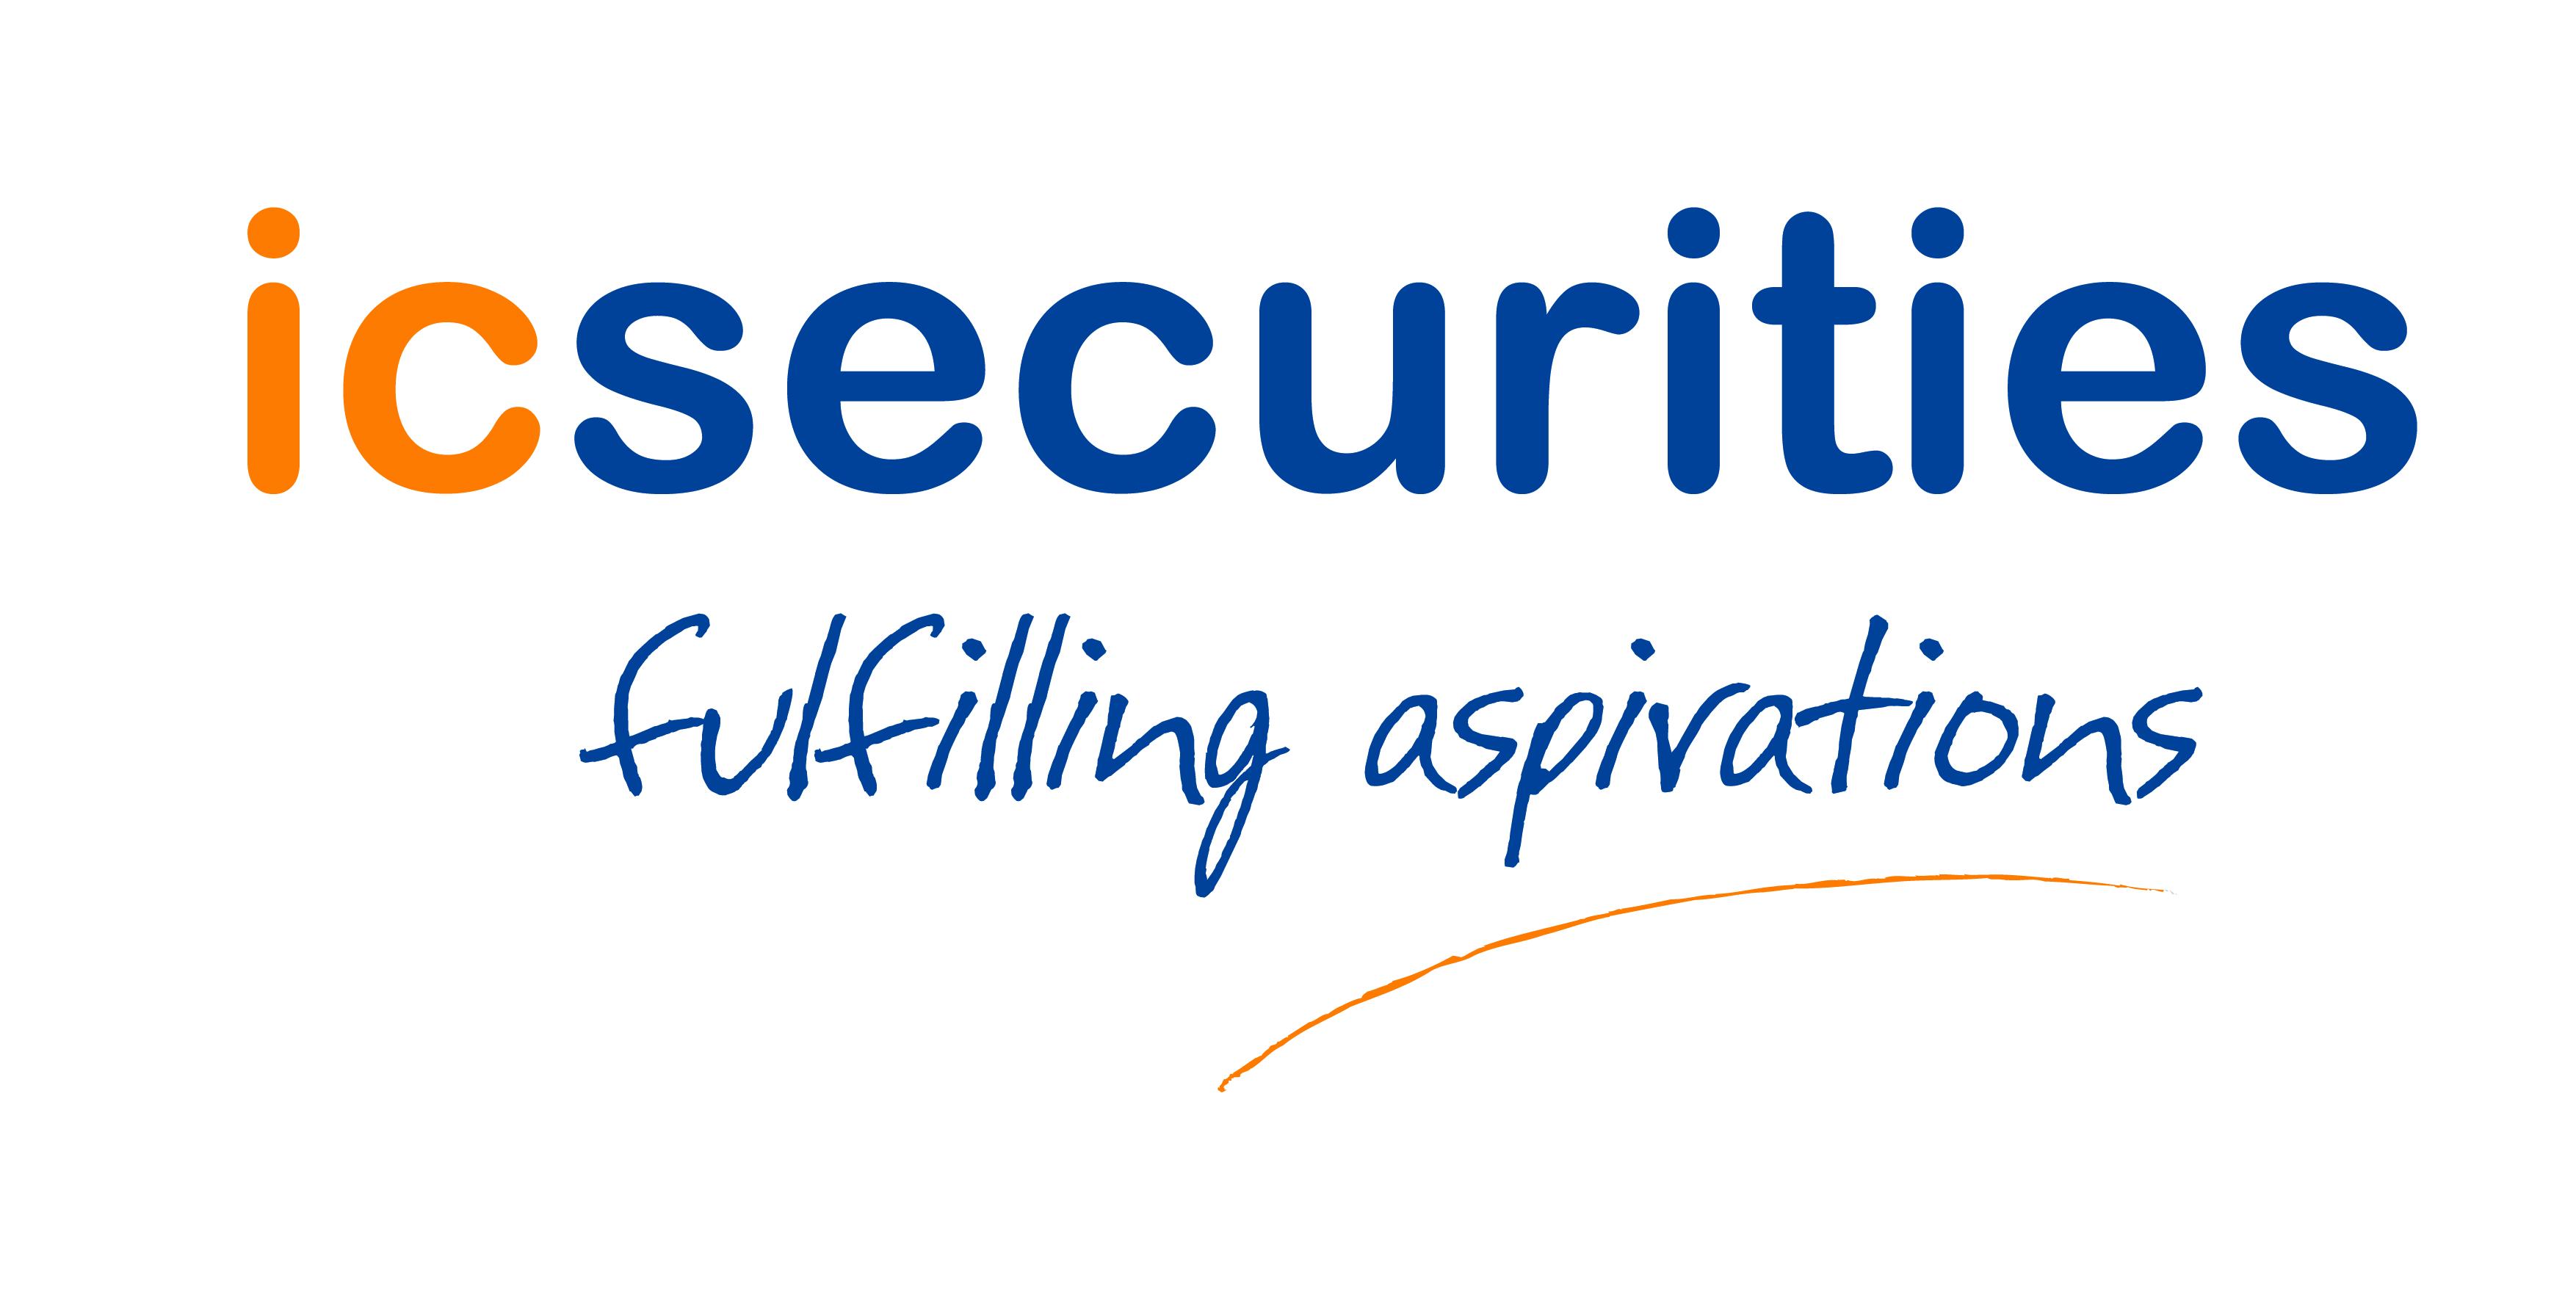 IC securities